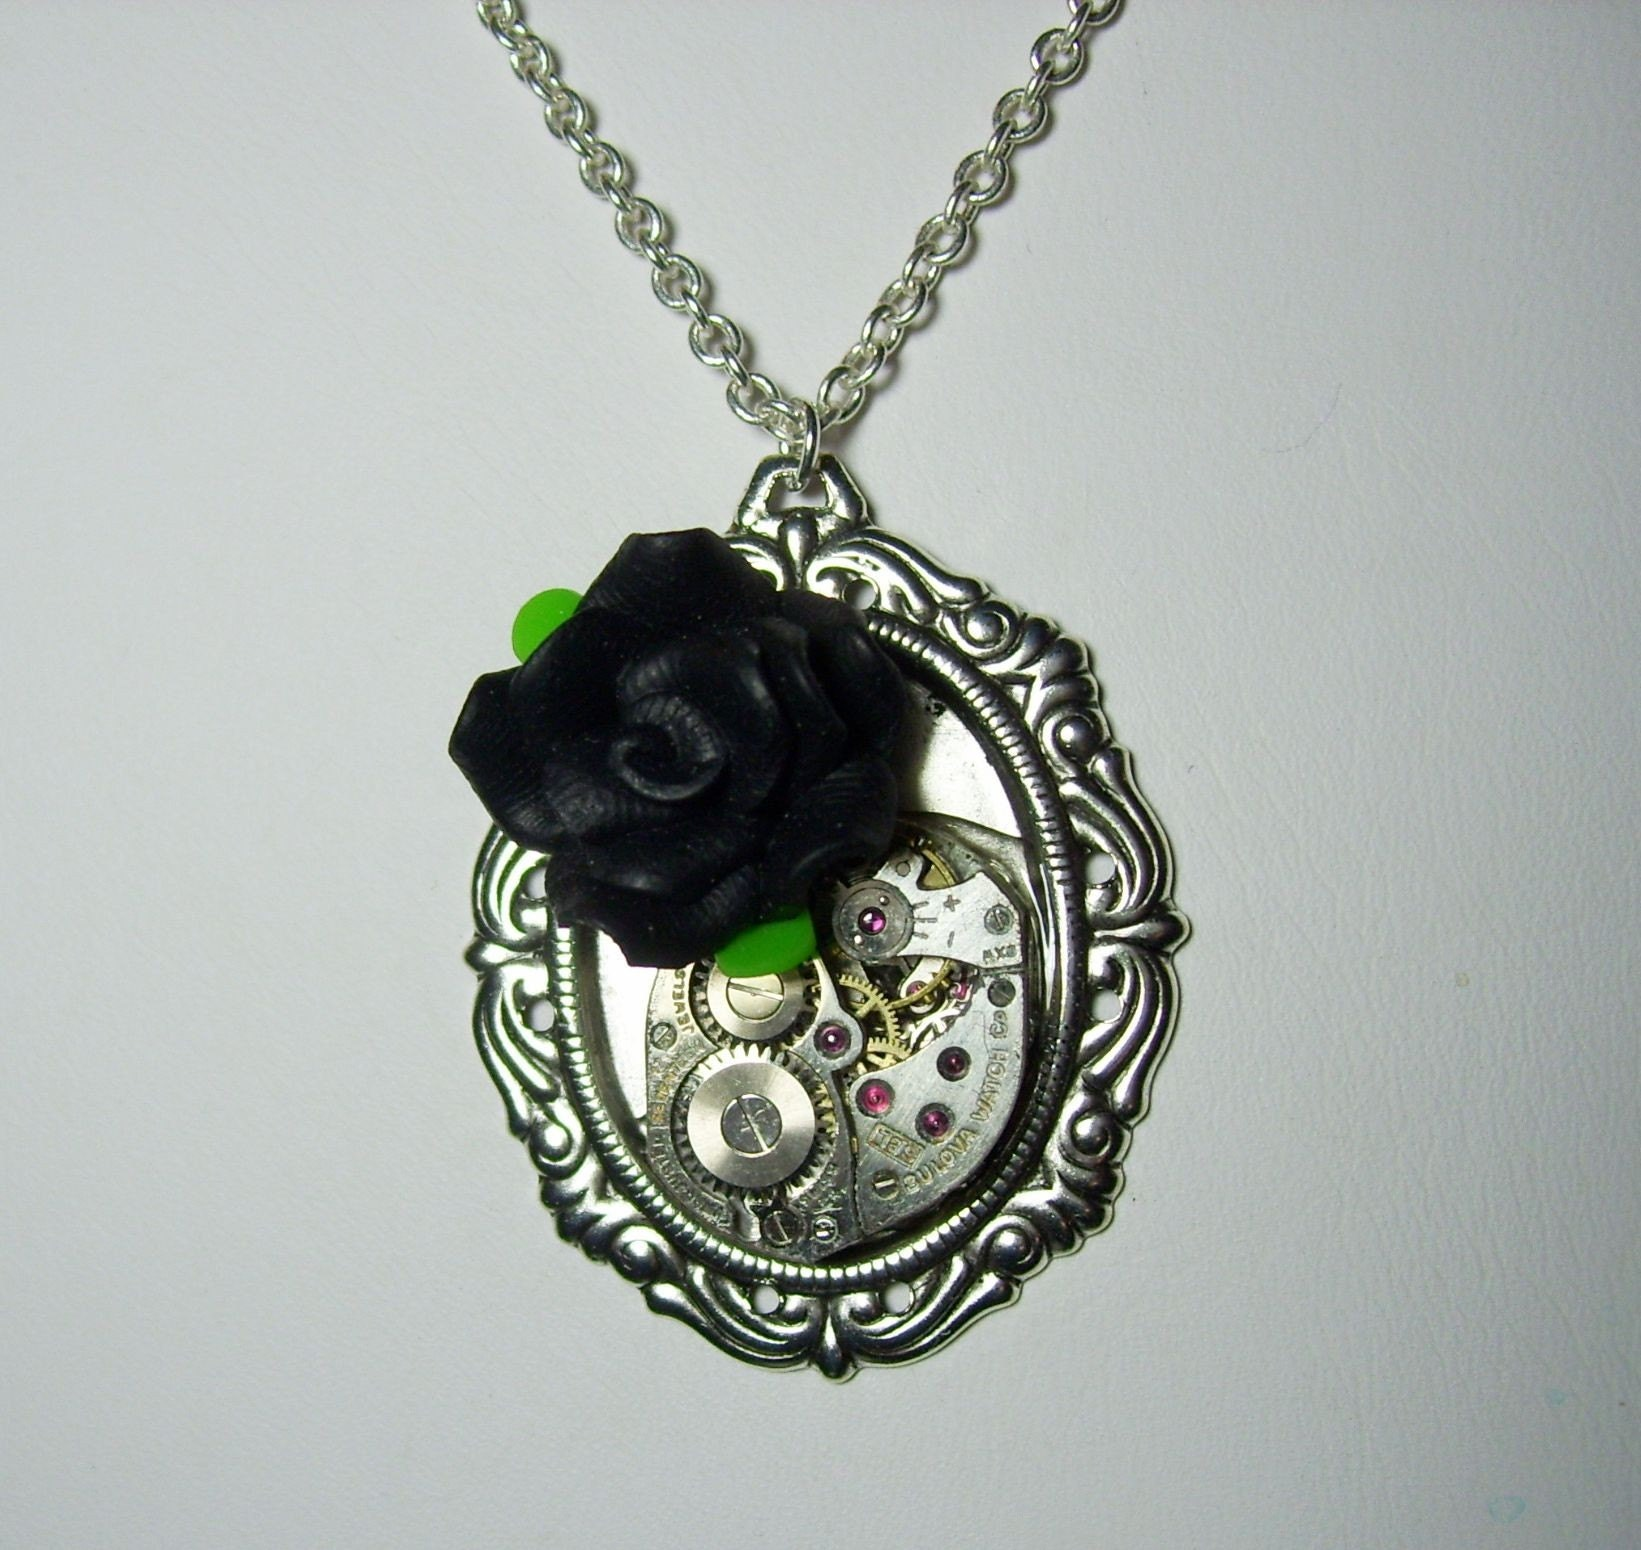 Antique Silver Vintage 17 Jewel Bulova Watch Movement Black Fimo Clay Rose  Gothic Lolita Steampunk Pendant Necklace new